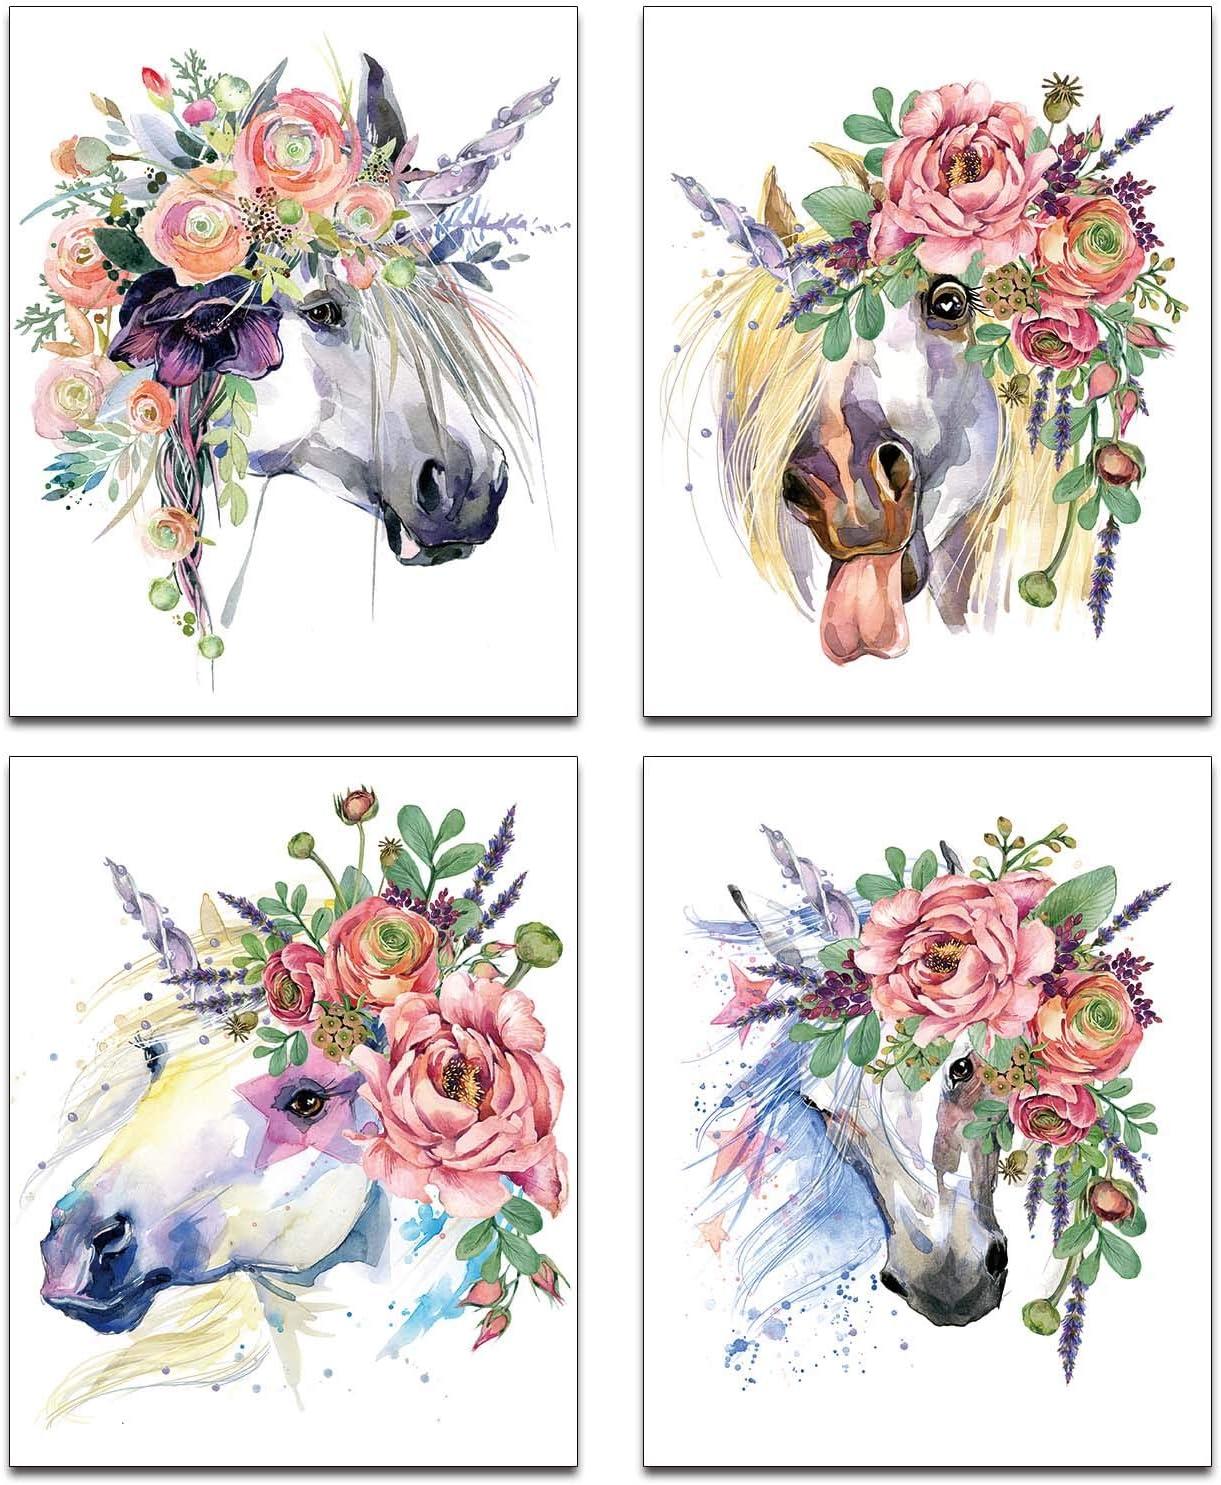 "Modern Abstract Art Watercolor Splash Cute Unicorn Horse Poster Prints Set of 4 (8""X10"" Canvas Picture) Children Kindergarten Boy Girl Wall Decor Art Painting Teens Bedroom Home Decor Unframed"